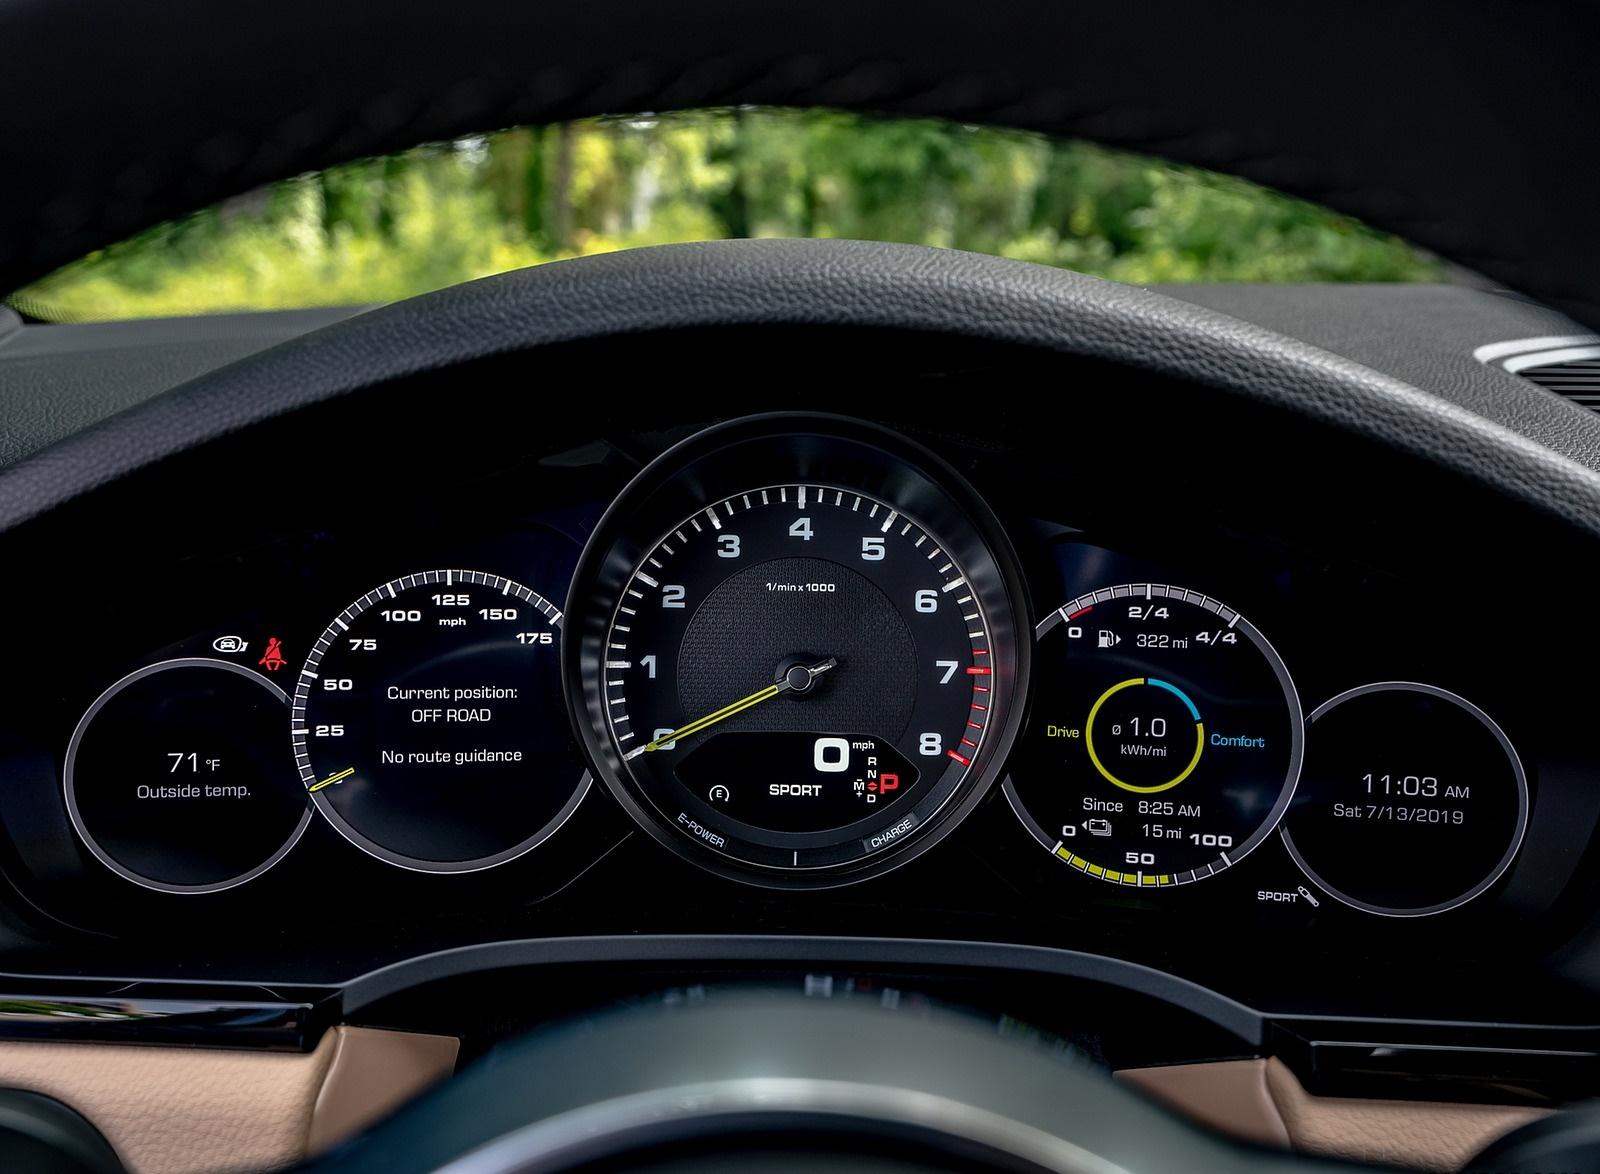 2019 Porsche Cayenne E-Hybrid (US-Spec) Digital Instrument Cluster Wallpapers #35 of 37